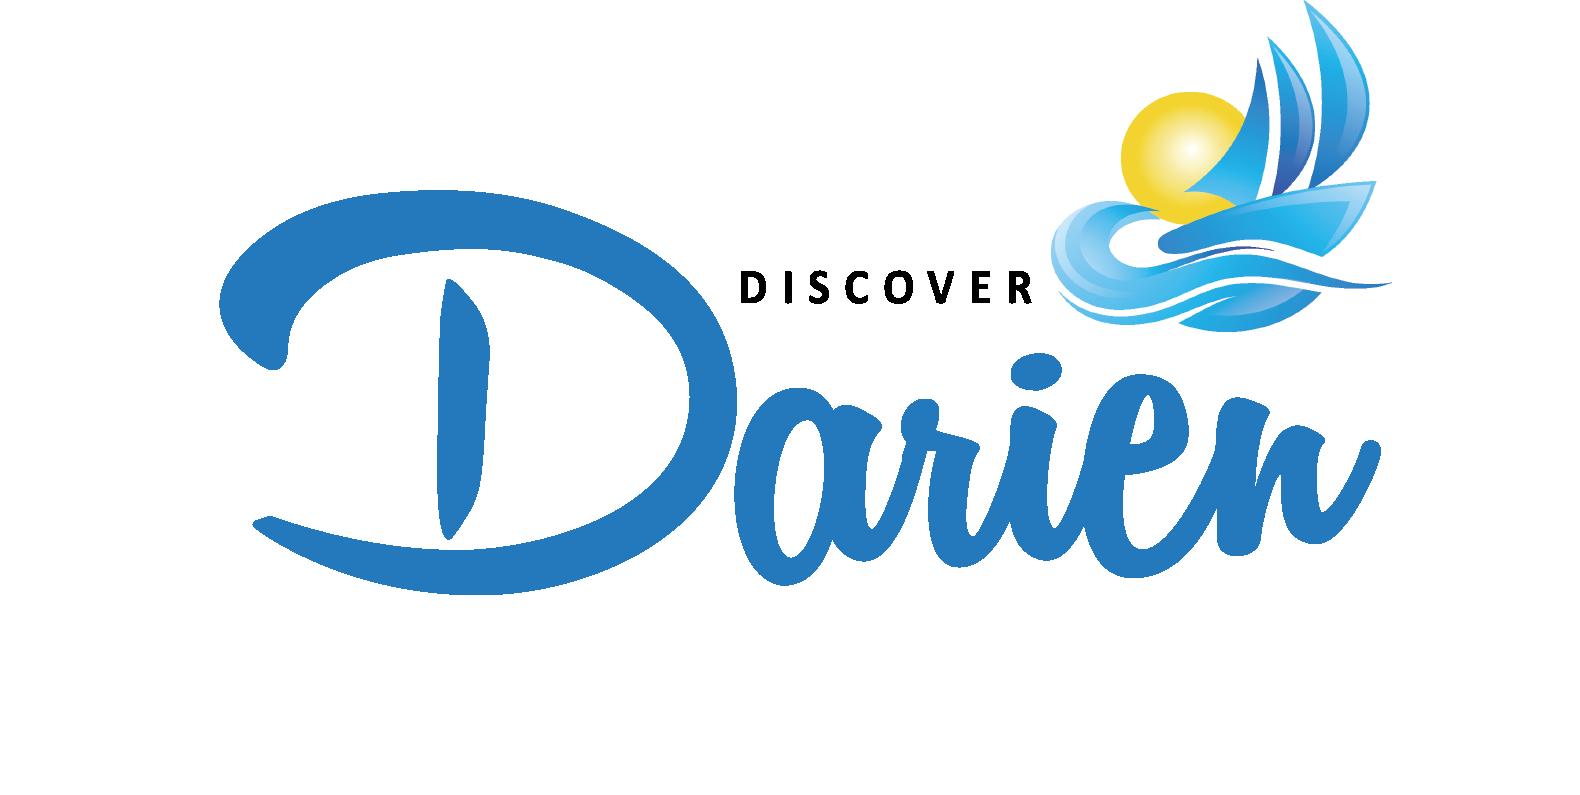 discoverdarien.com